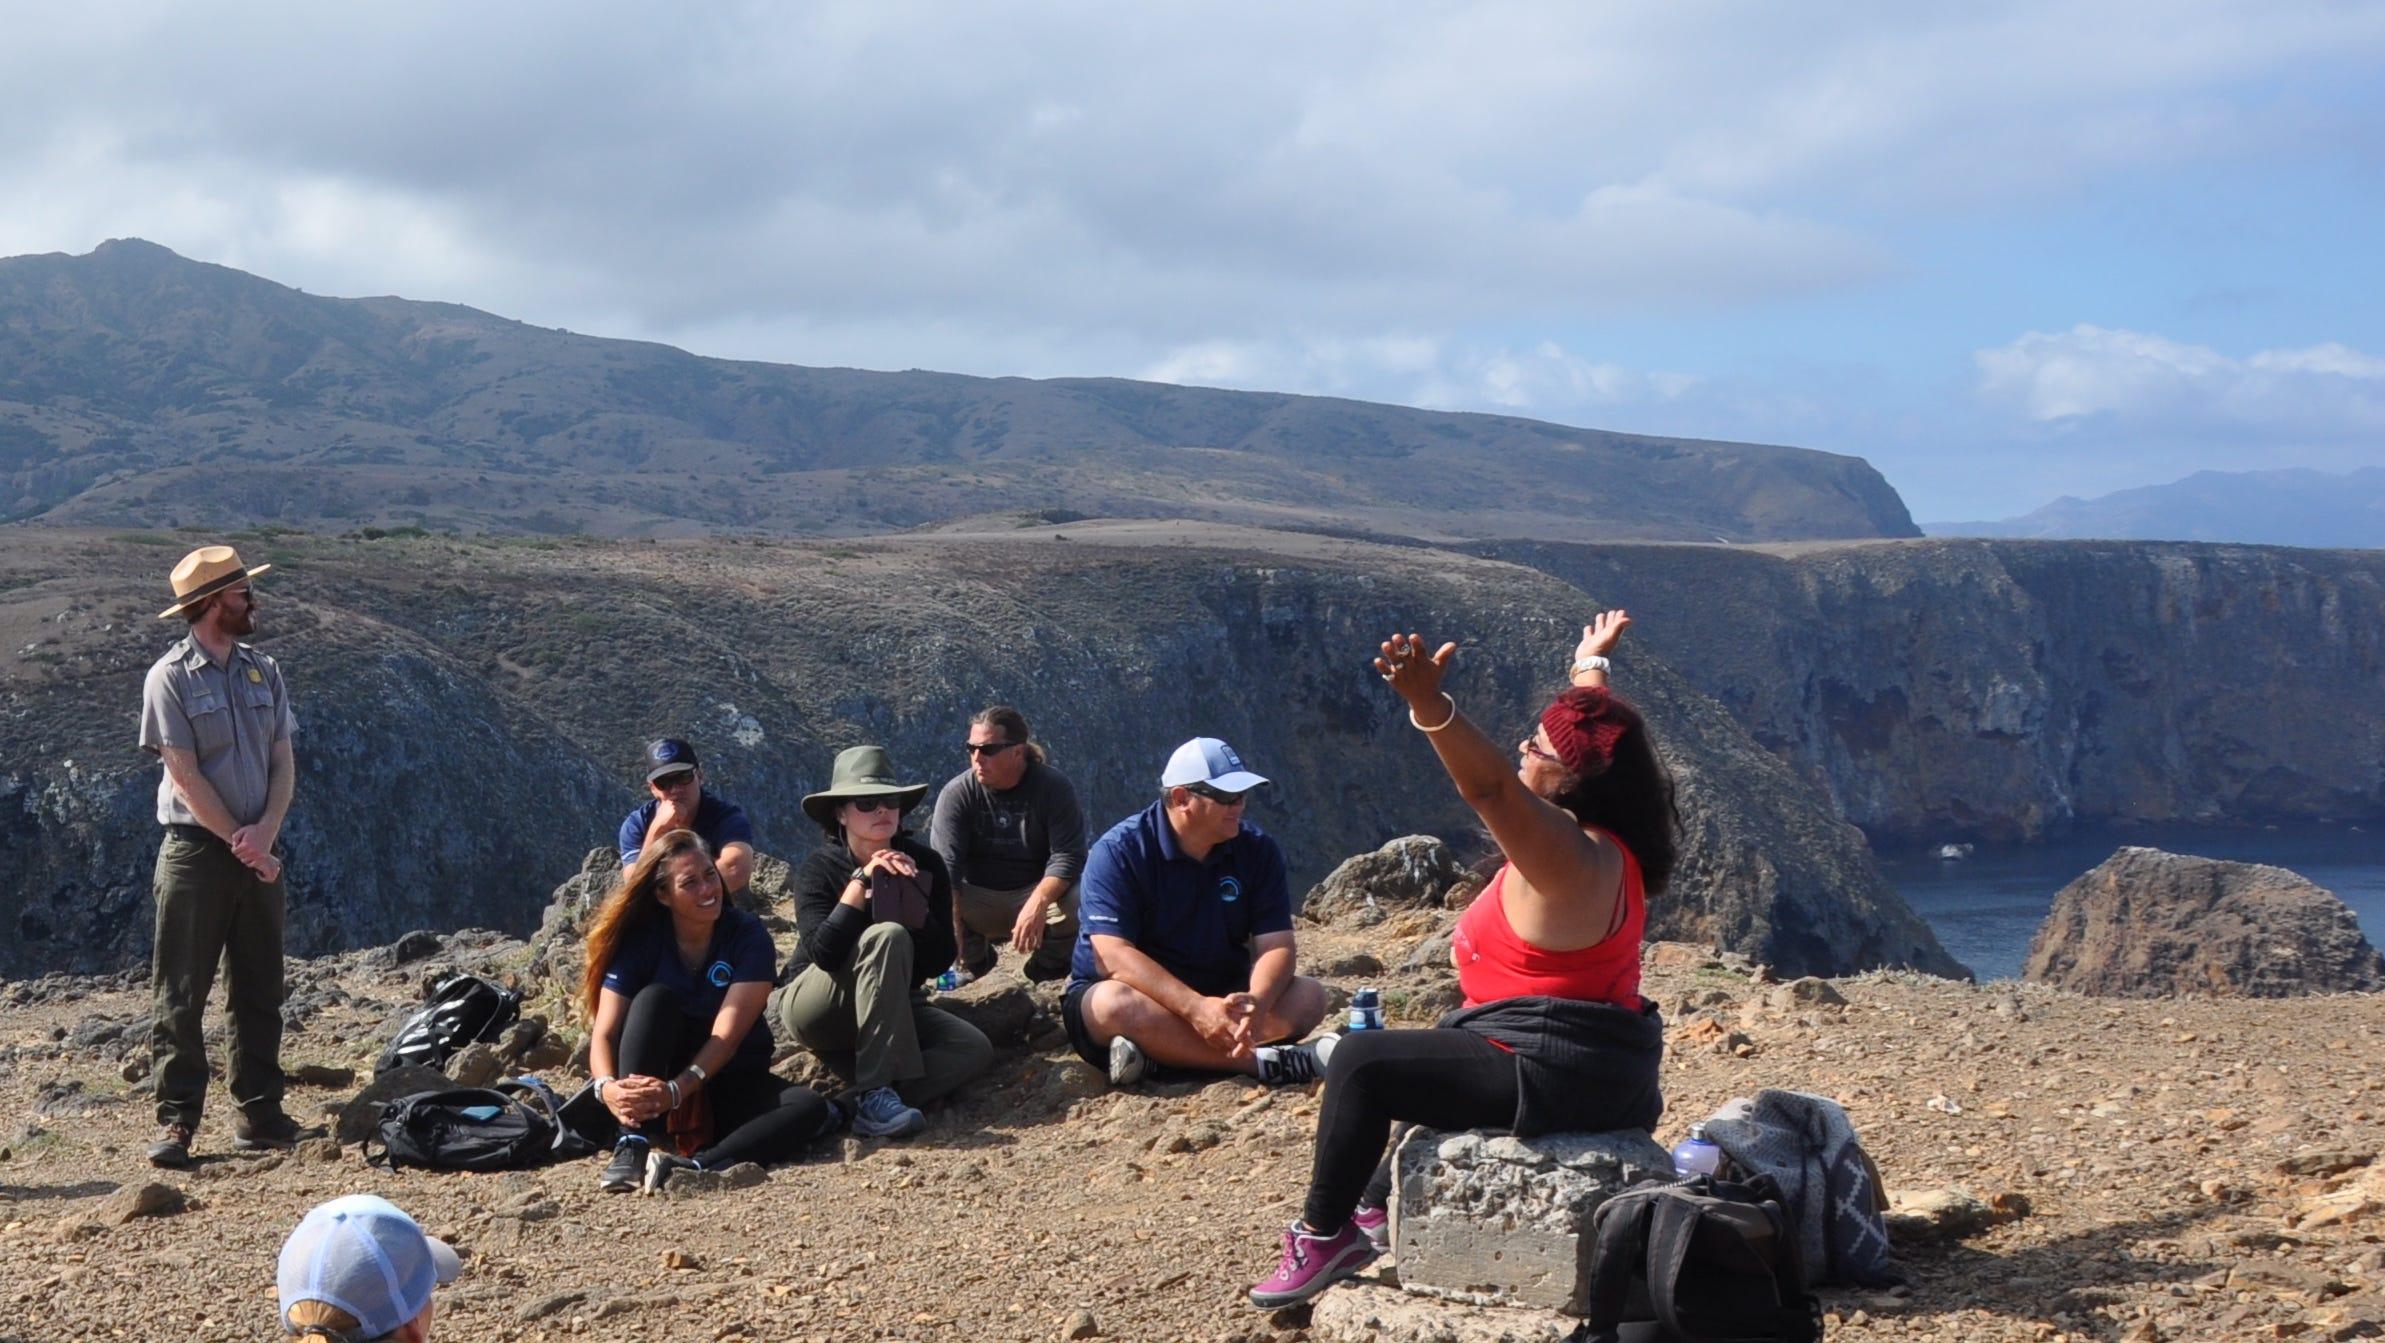 Local Chumash elders and crew members from the Hikianalia share stories on Santa Cruz Island.